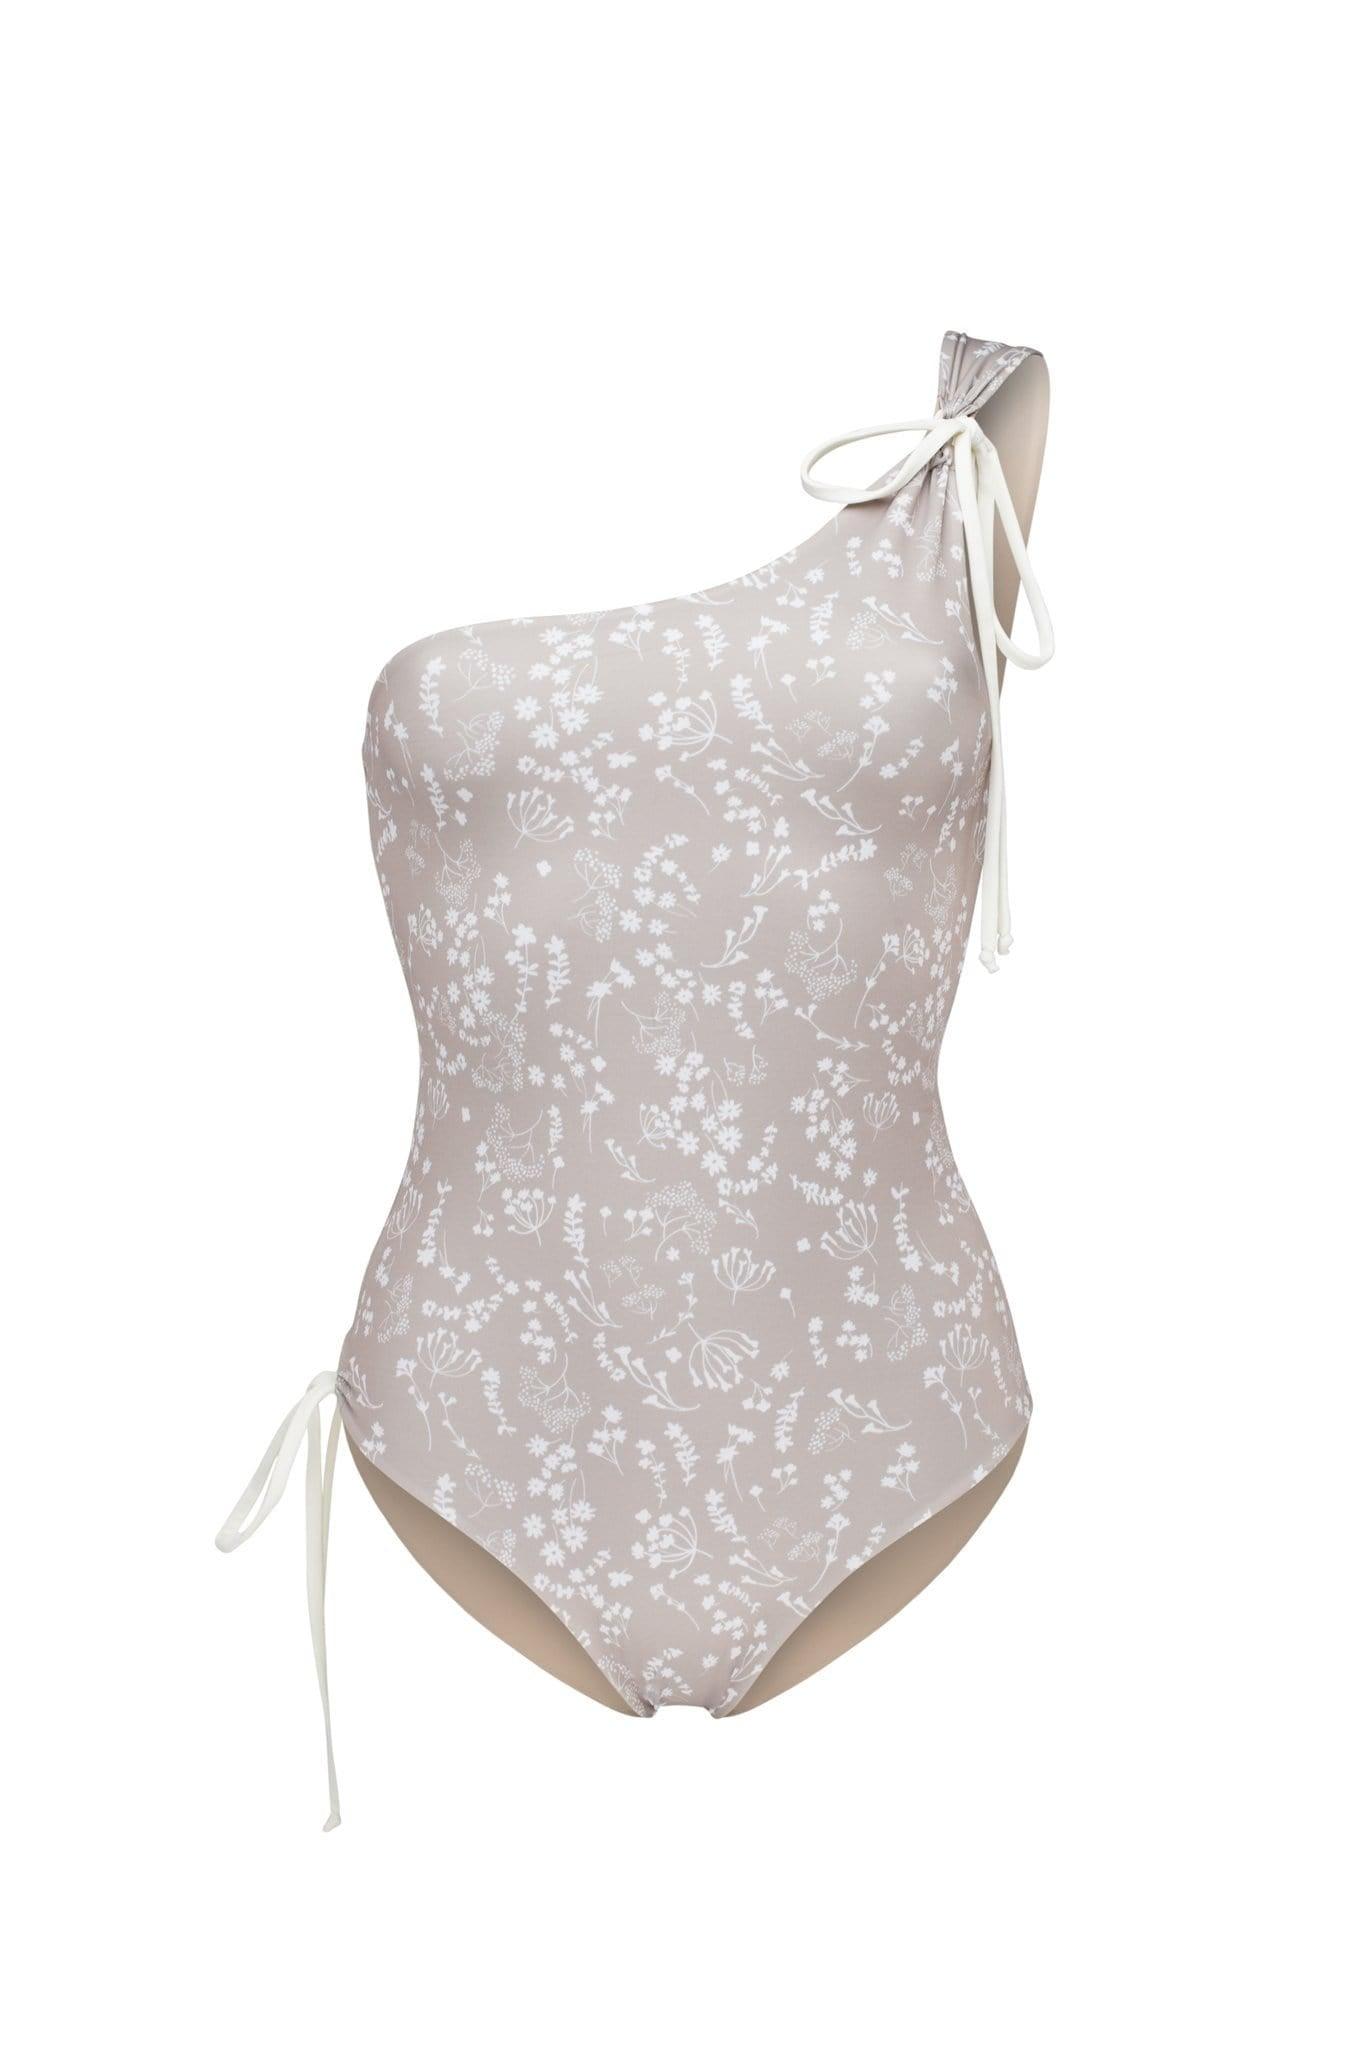 Ozero Swimwear Rotorua ECONYL® Asymmetric One Piece Swimsuit   Reversible Russian Summer Print/Cloud